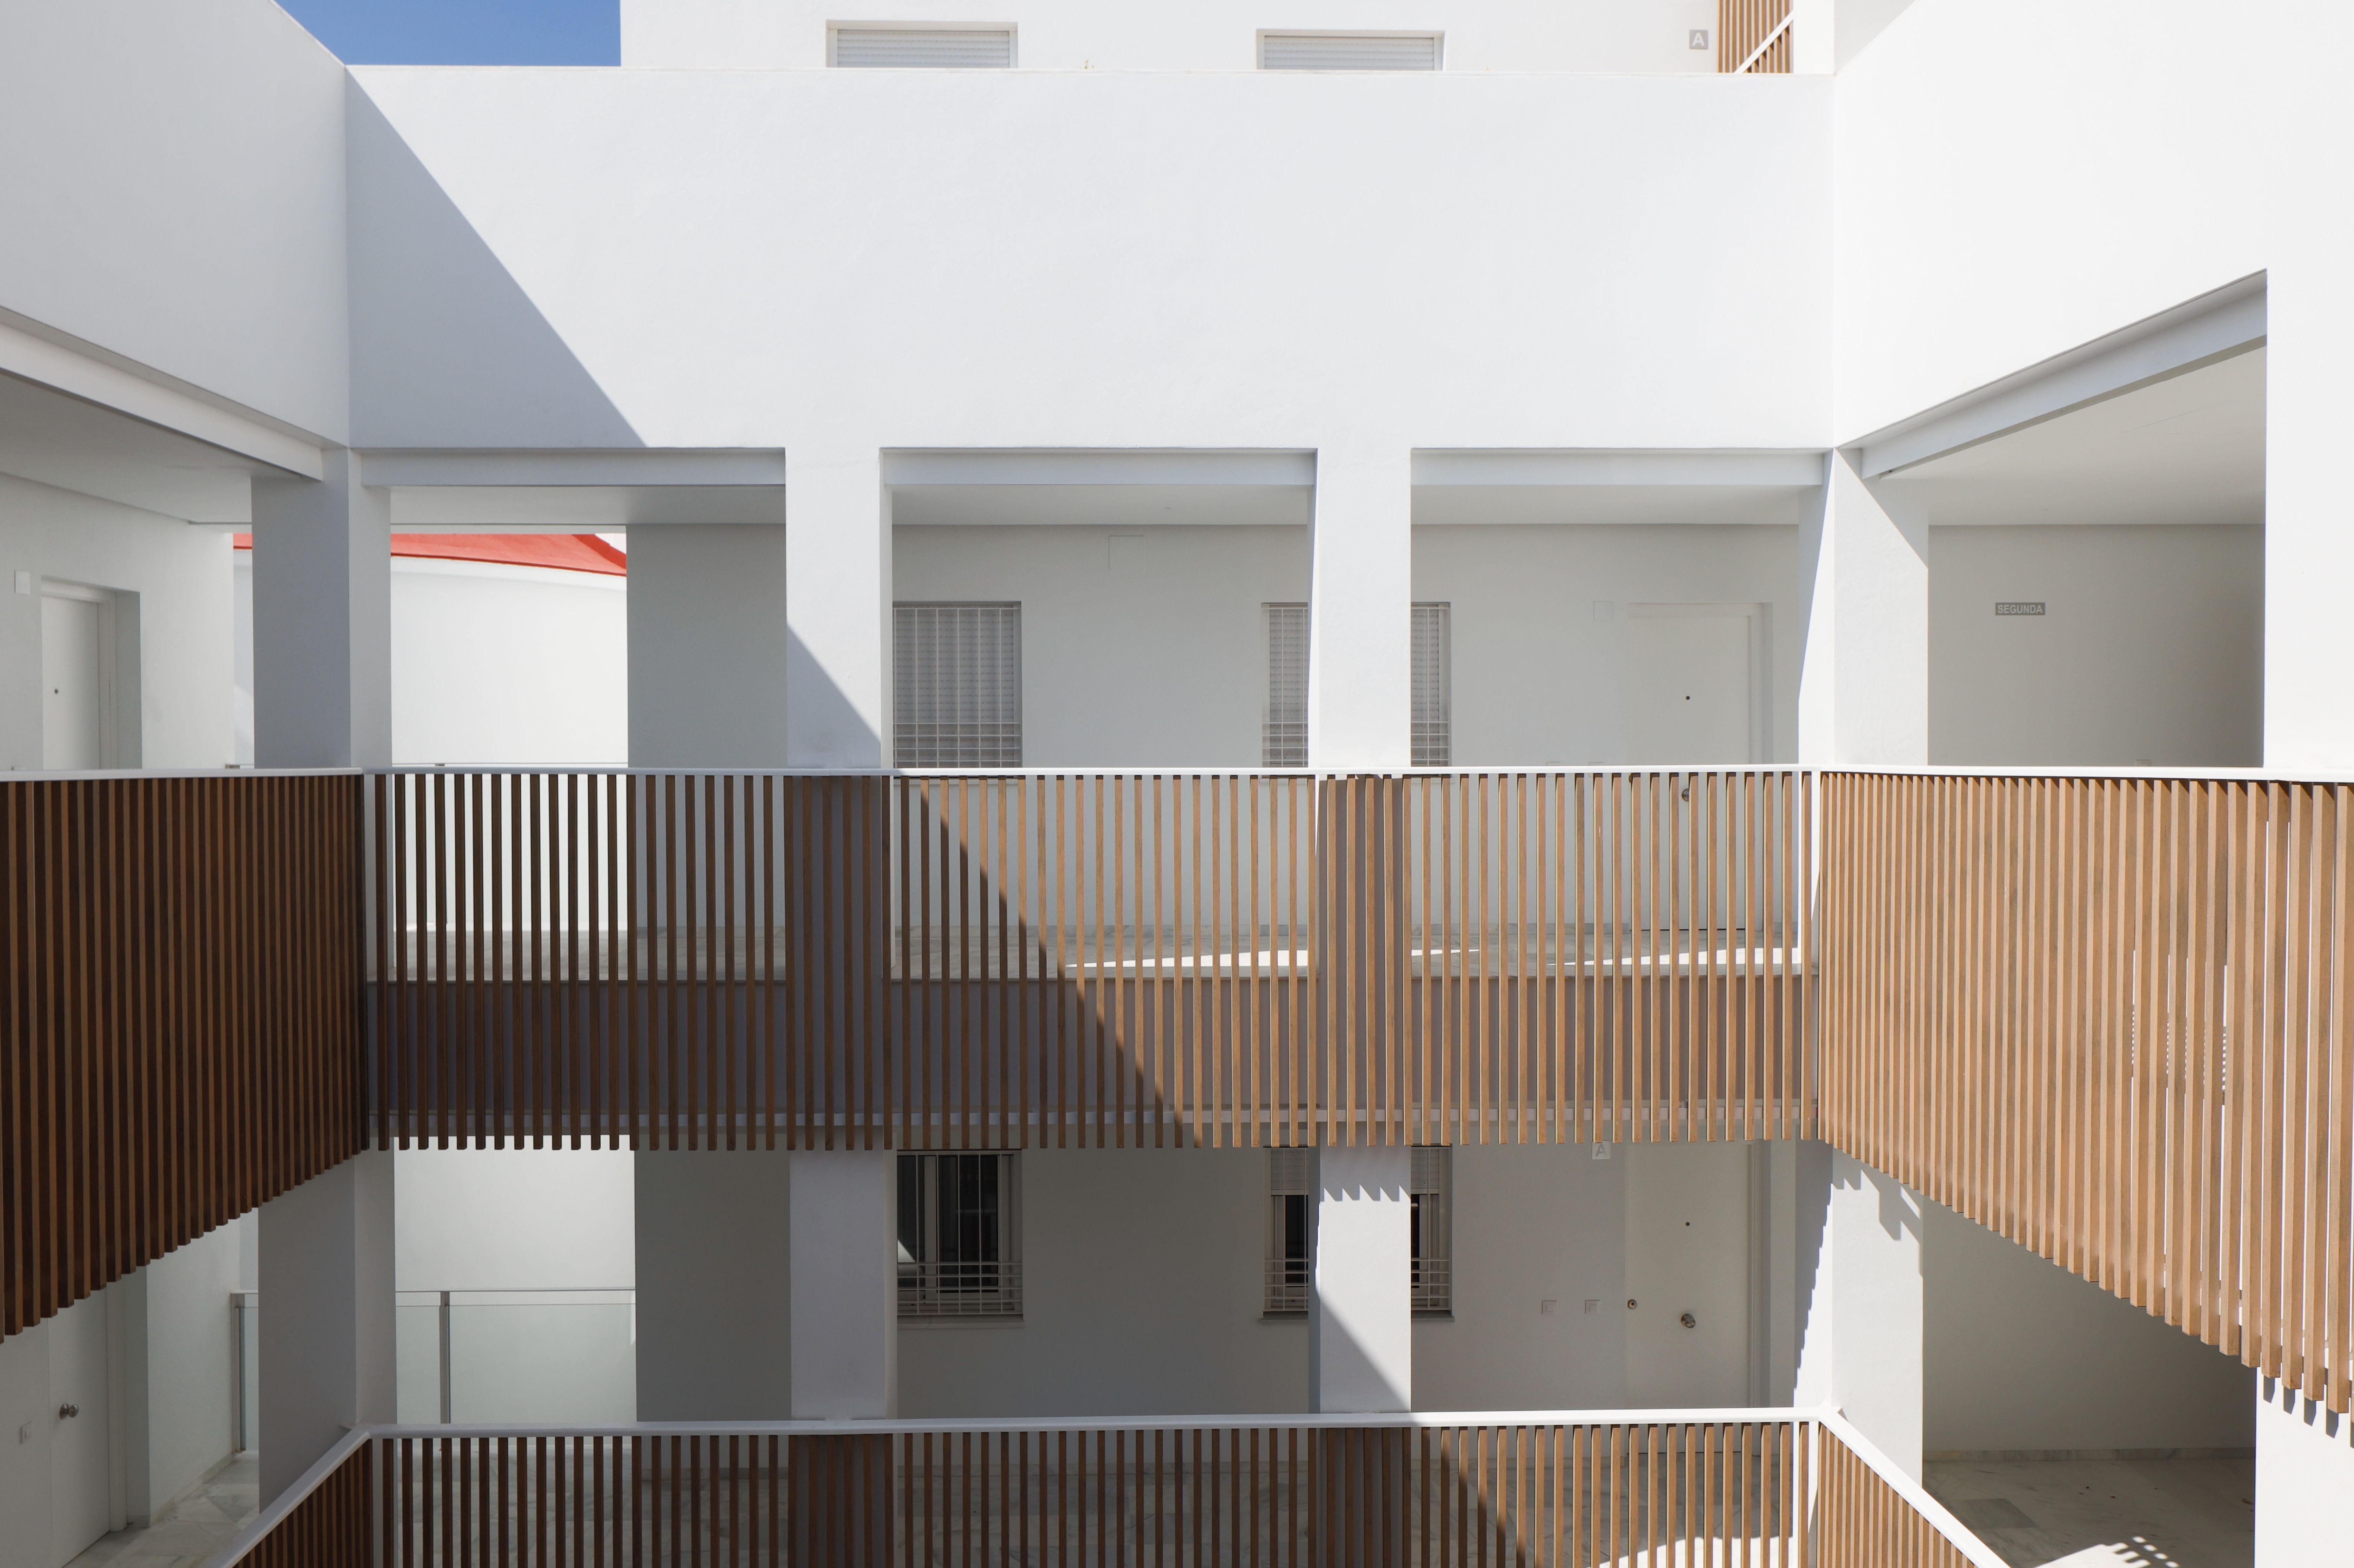 Foto 1 de Arquitectura en Cádiz | VILCHES ARQUITECTOS